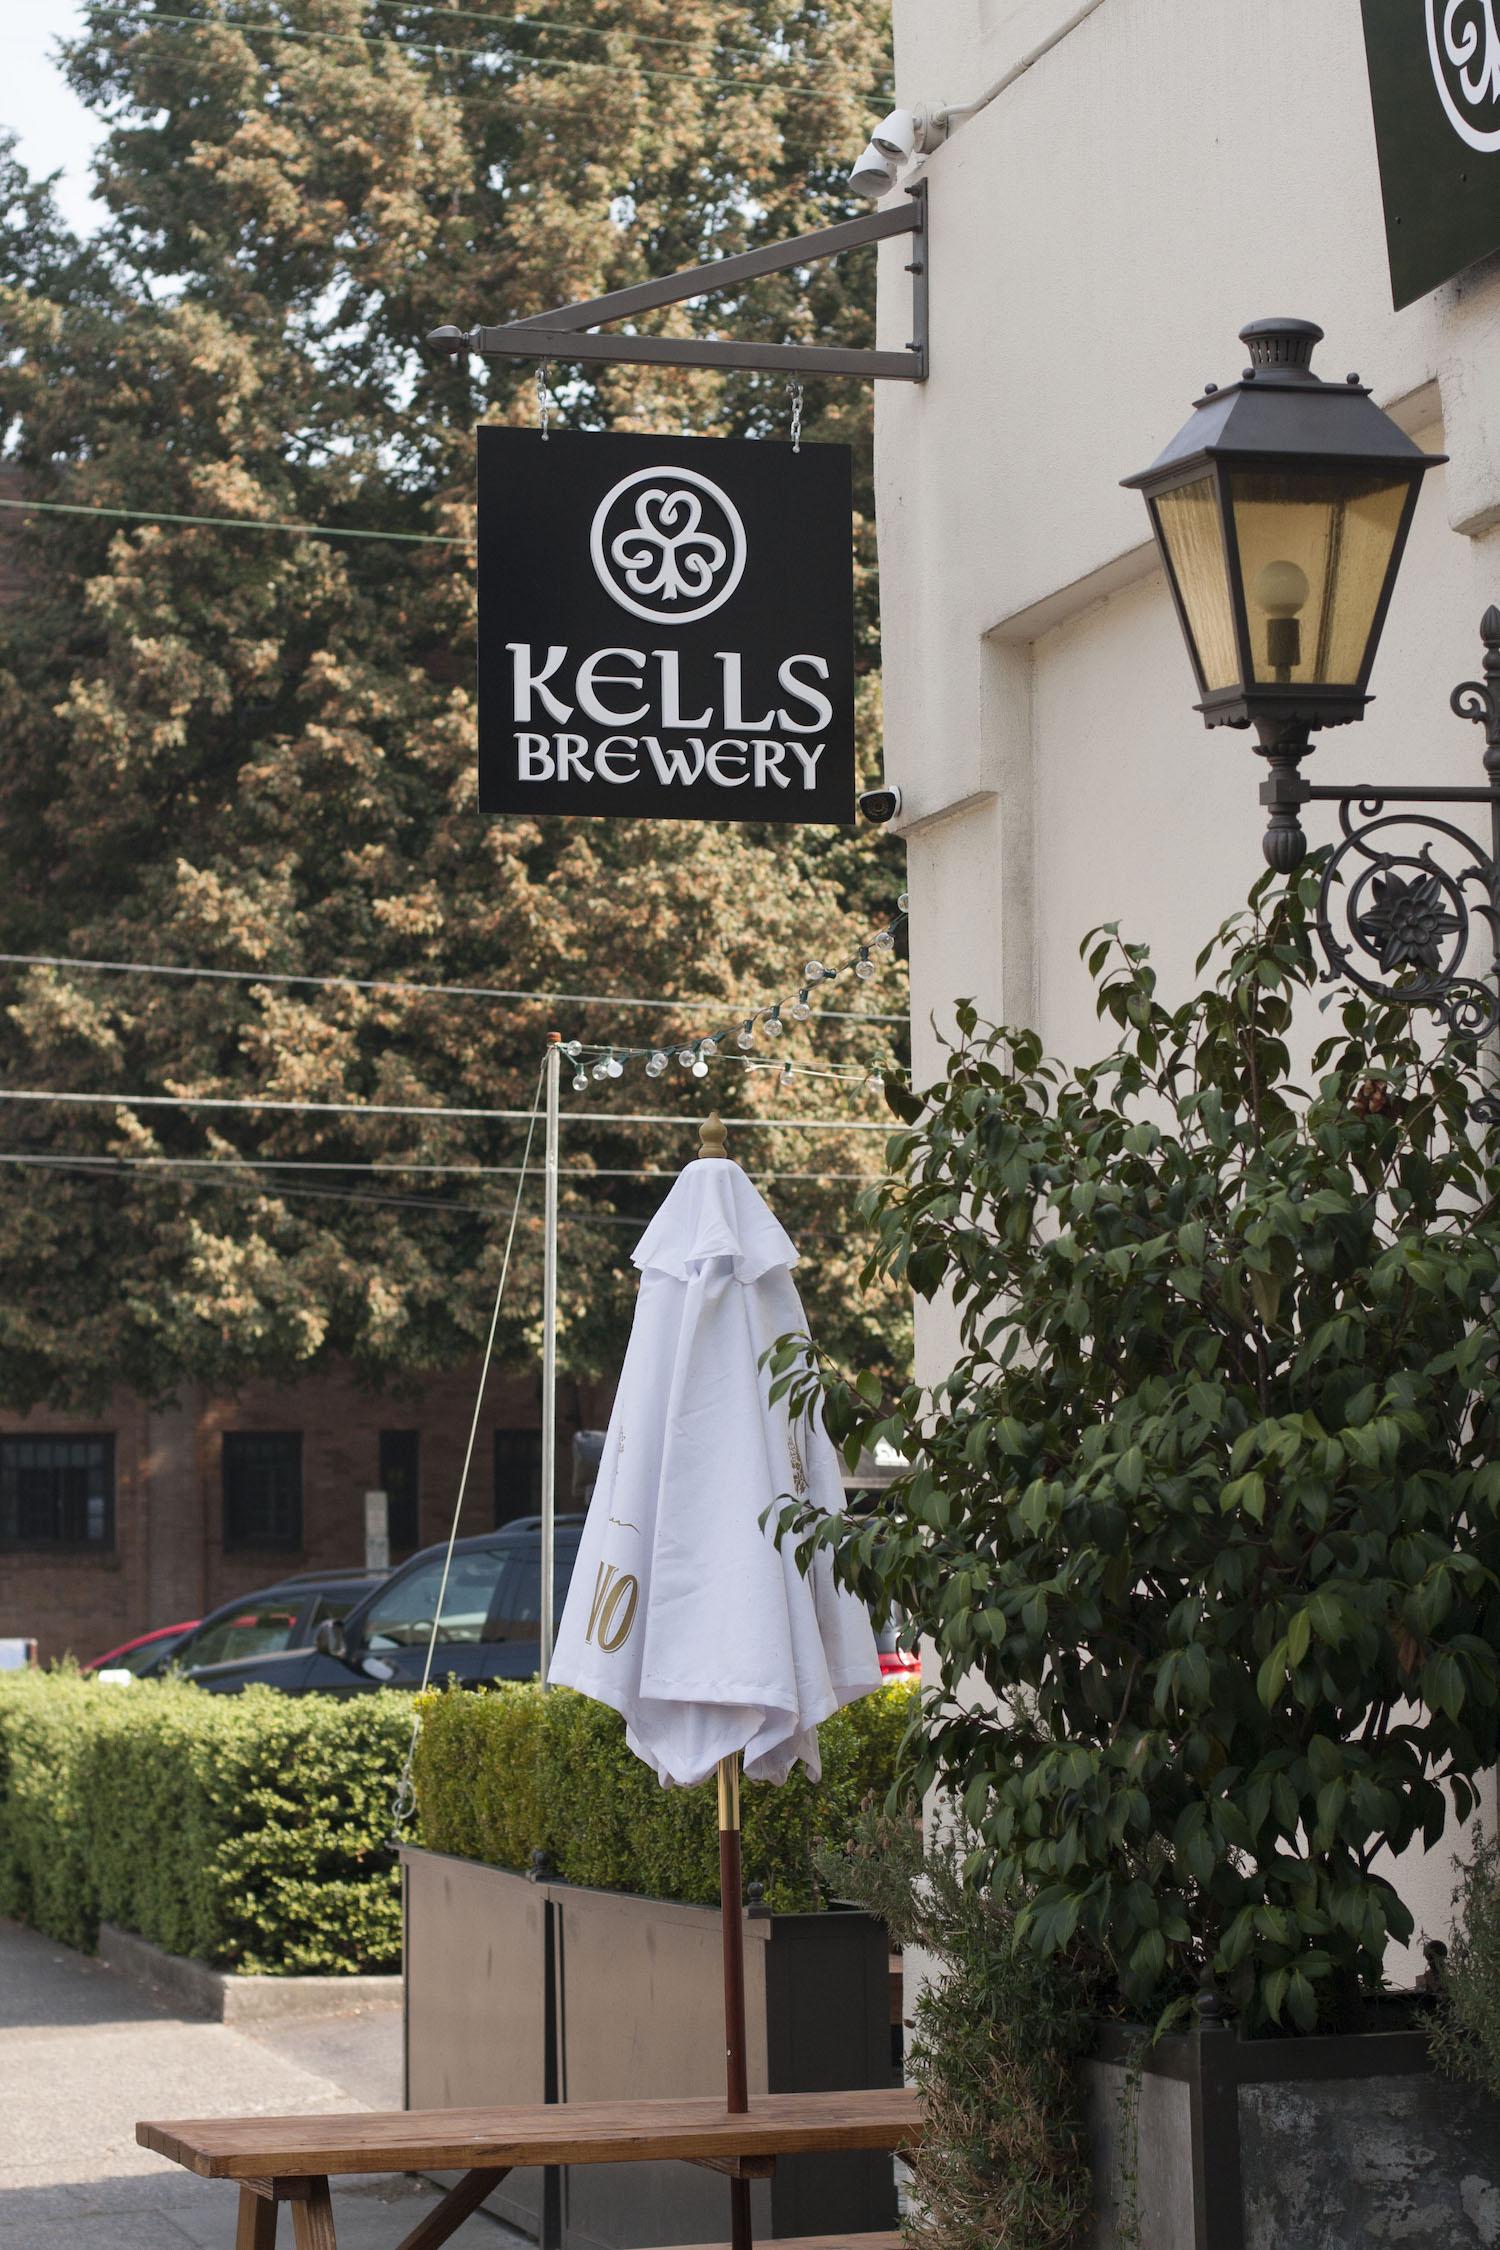 Kells2.jpg